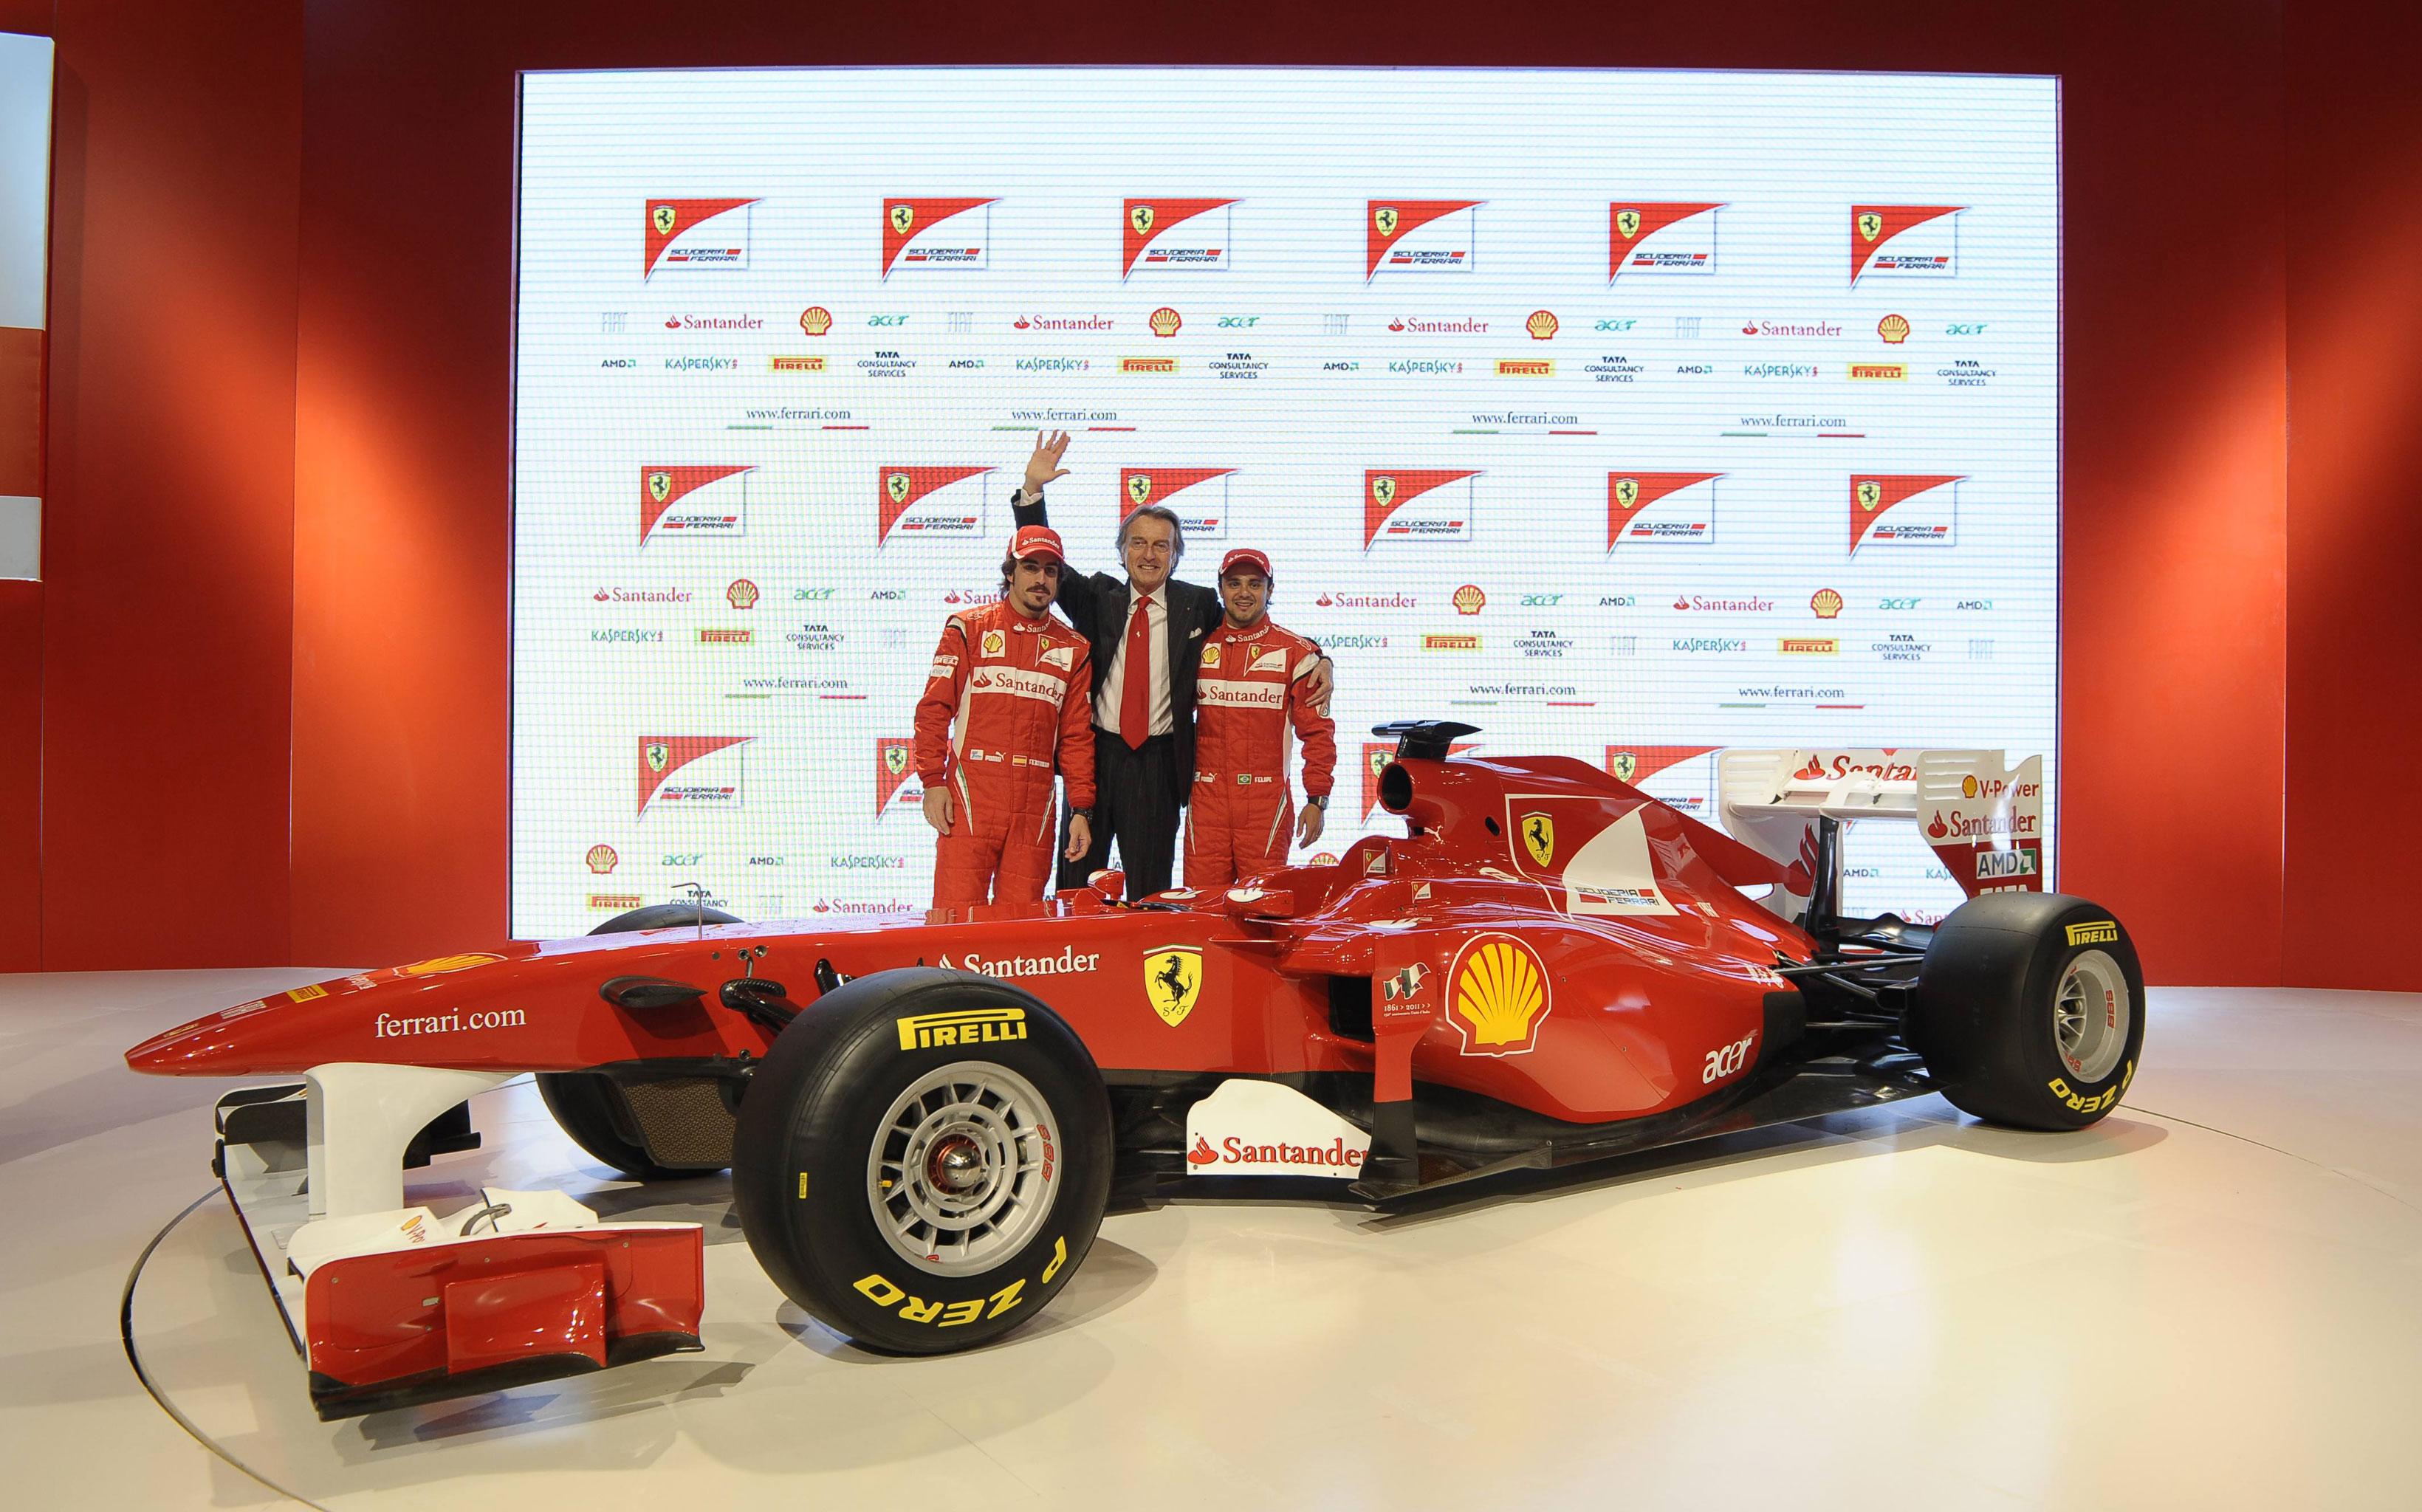 Формула-1, гонщики, фото, обои на рабочий стол